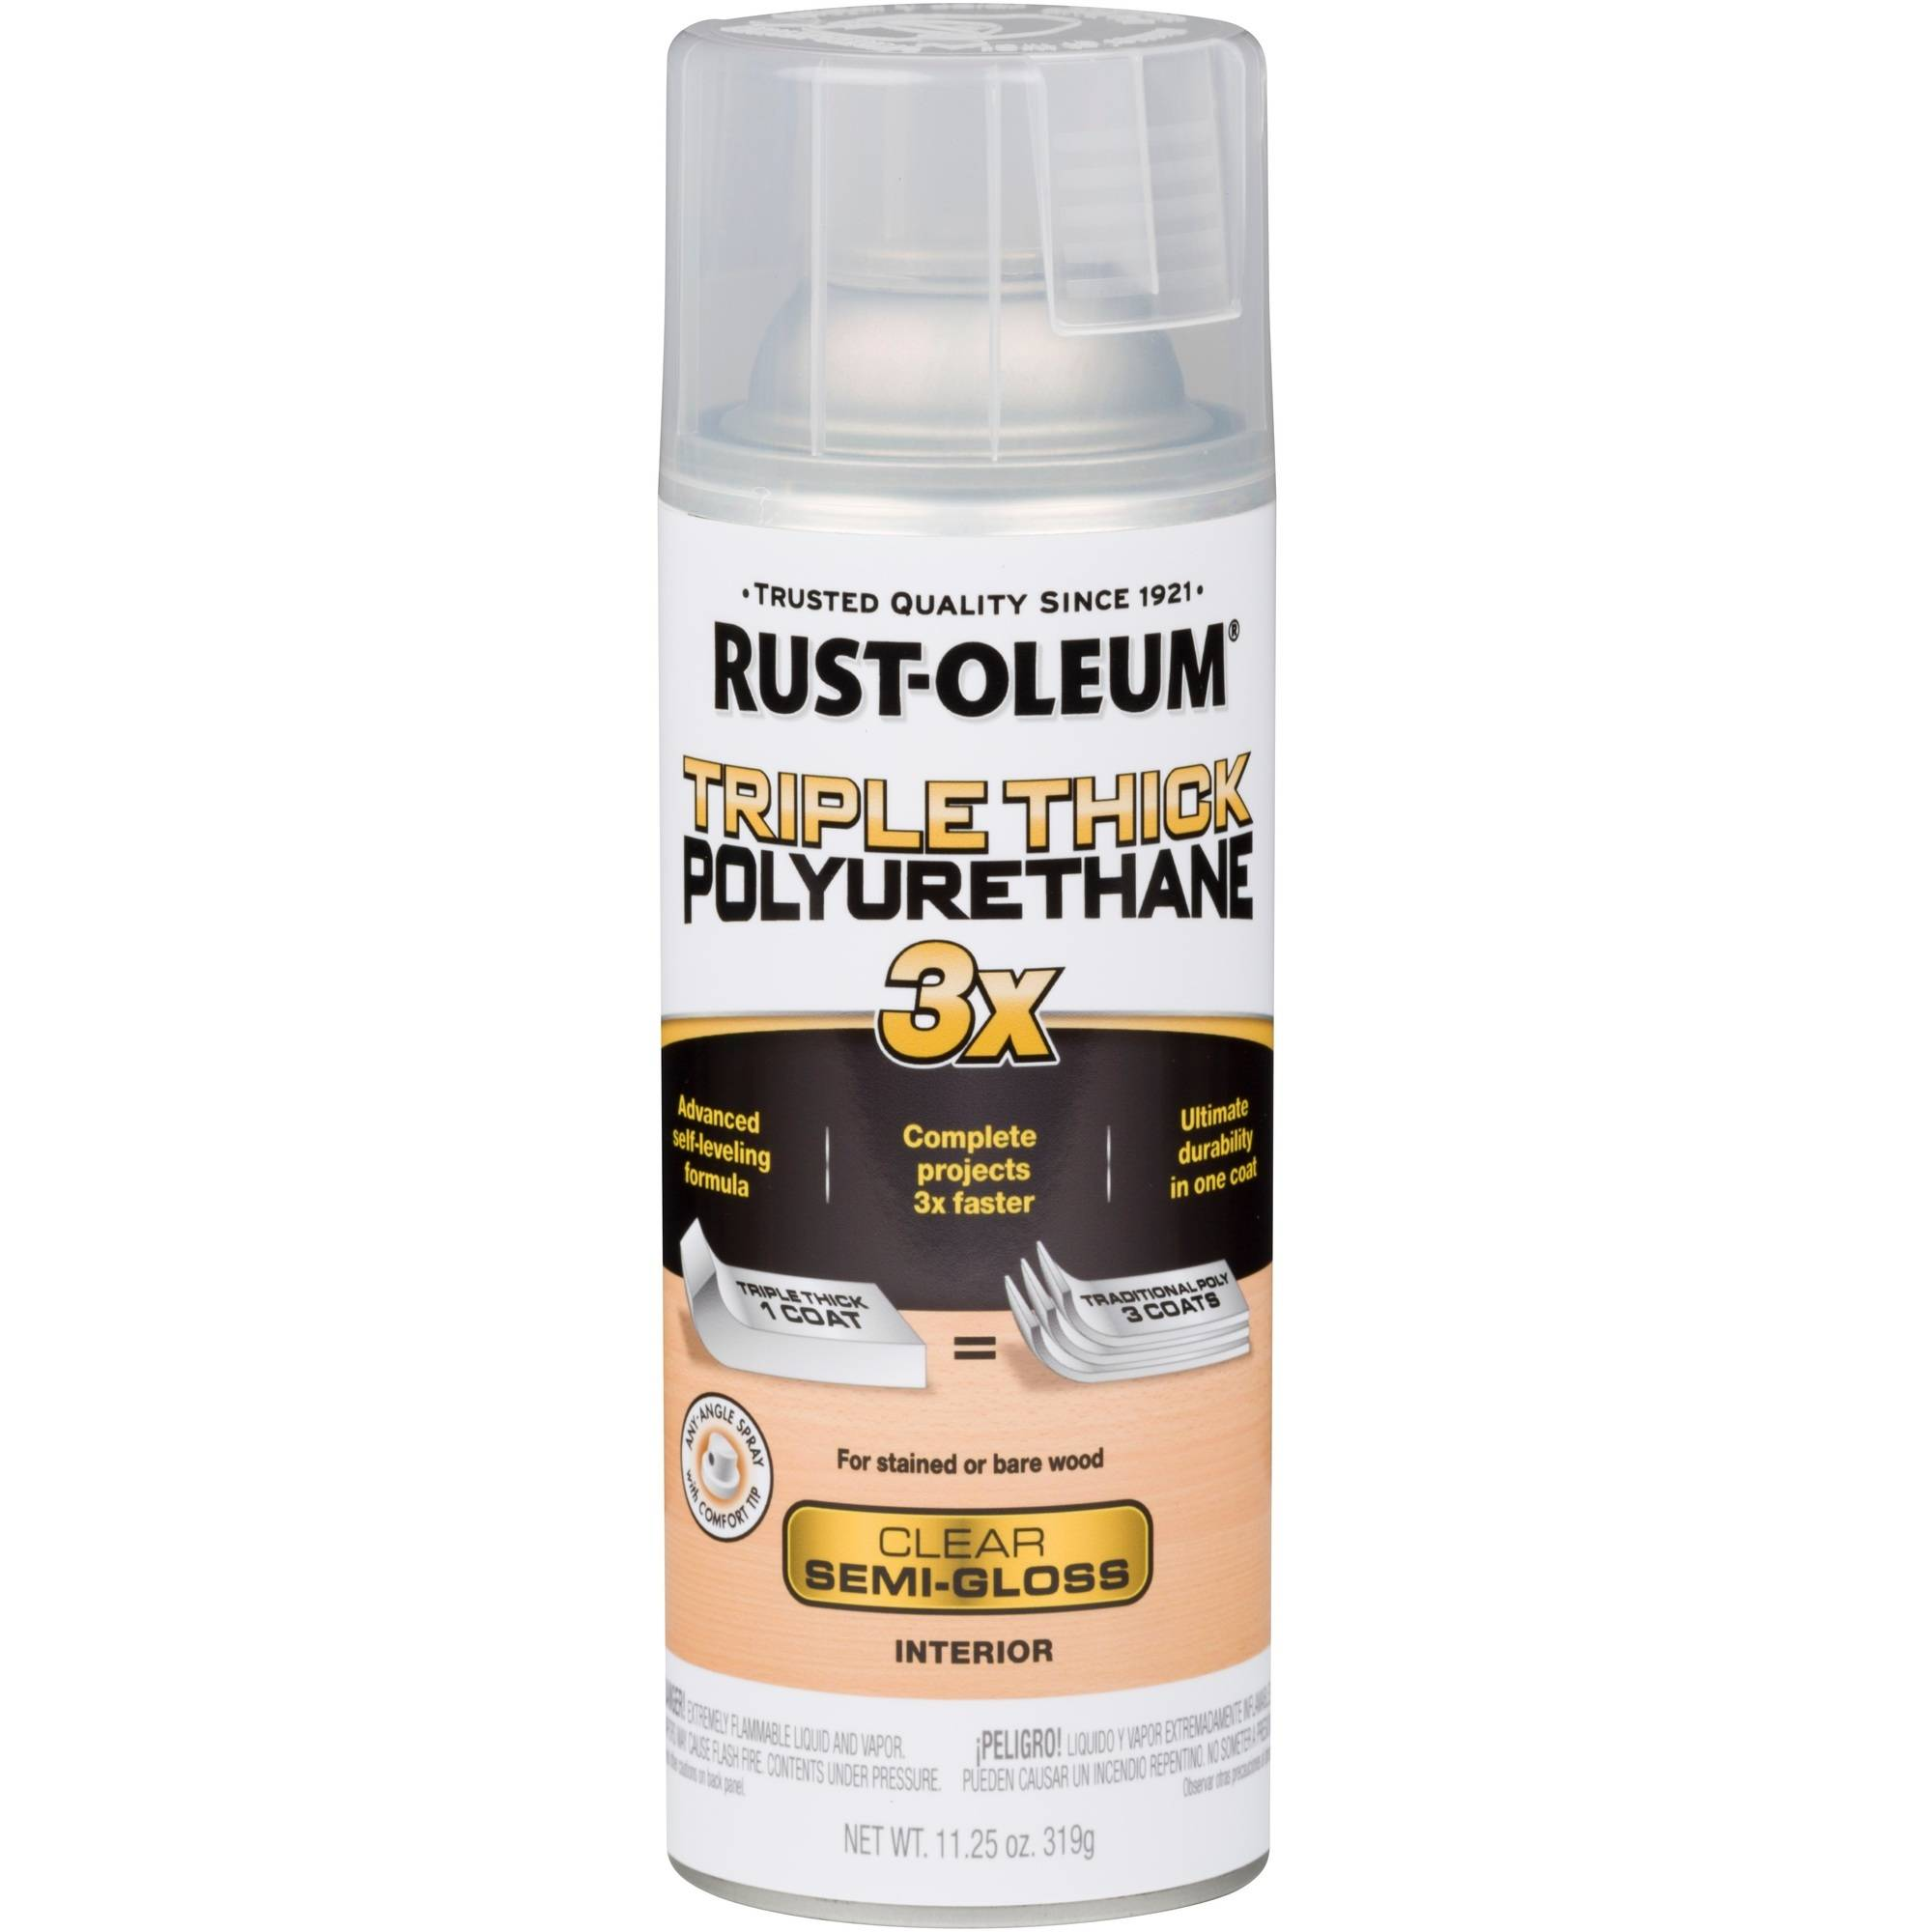 Rust-Oleum Triple Thick Polyurethane Spray